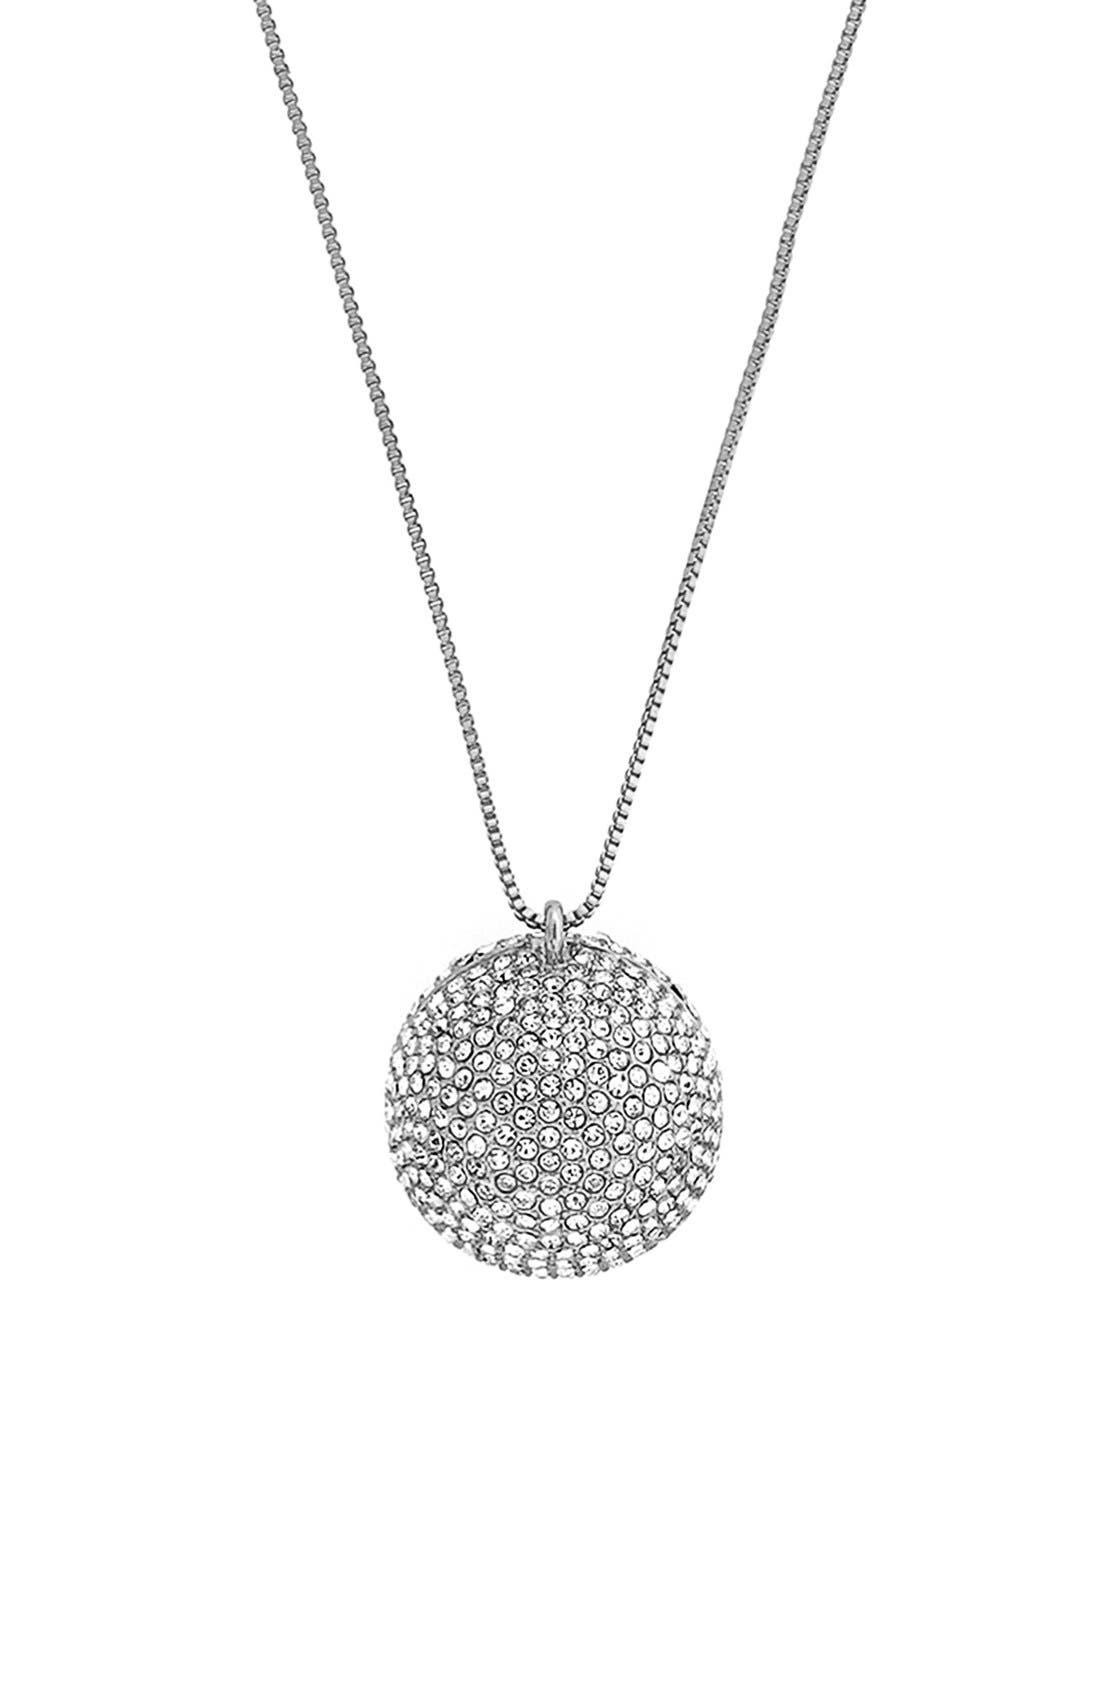 Alternate Image 1 Selected - Vince Camuto Pavé Ball Locket Long Pendant Necklace